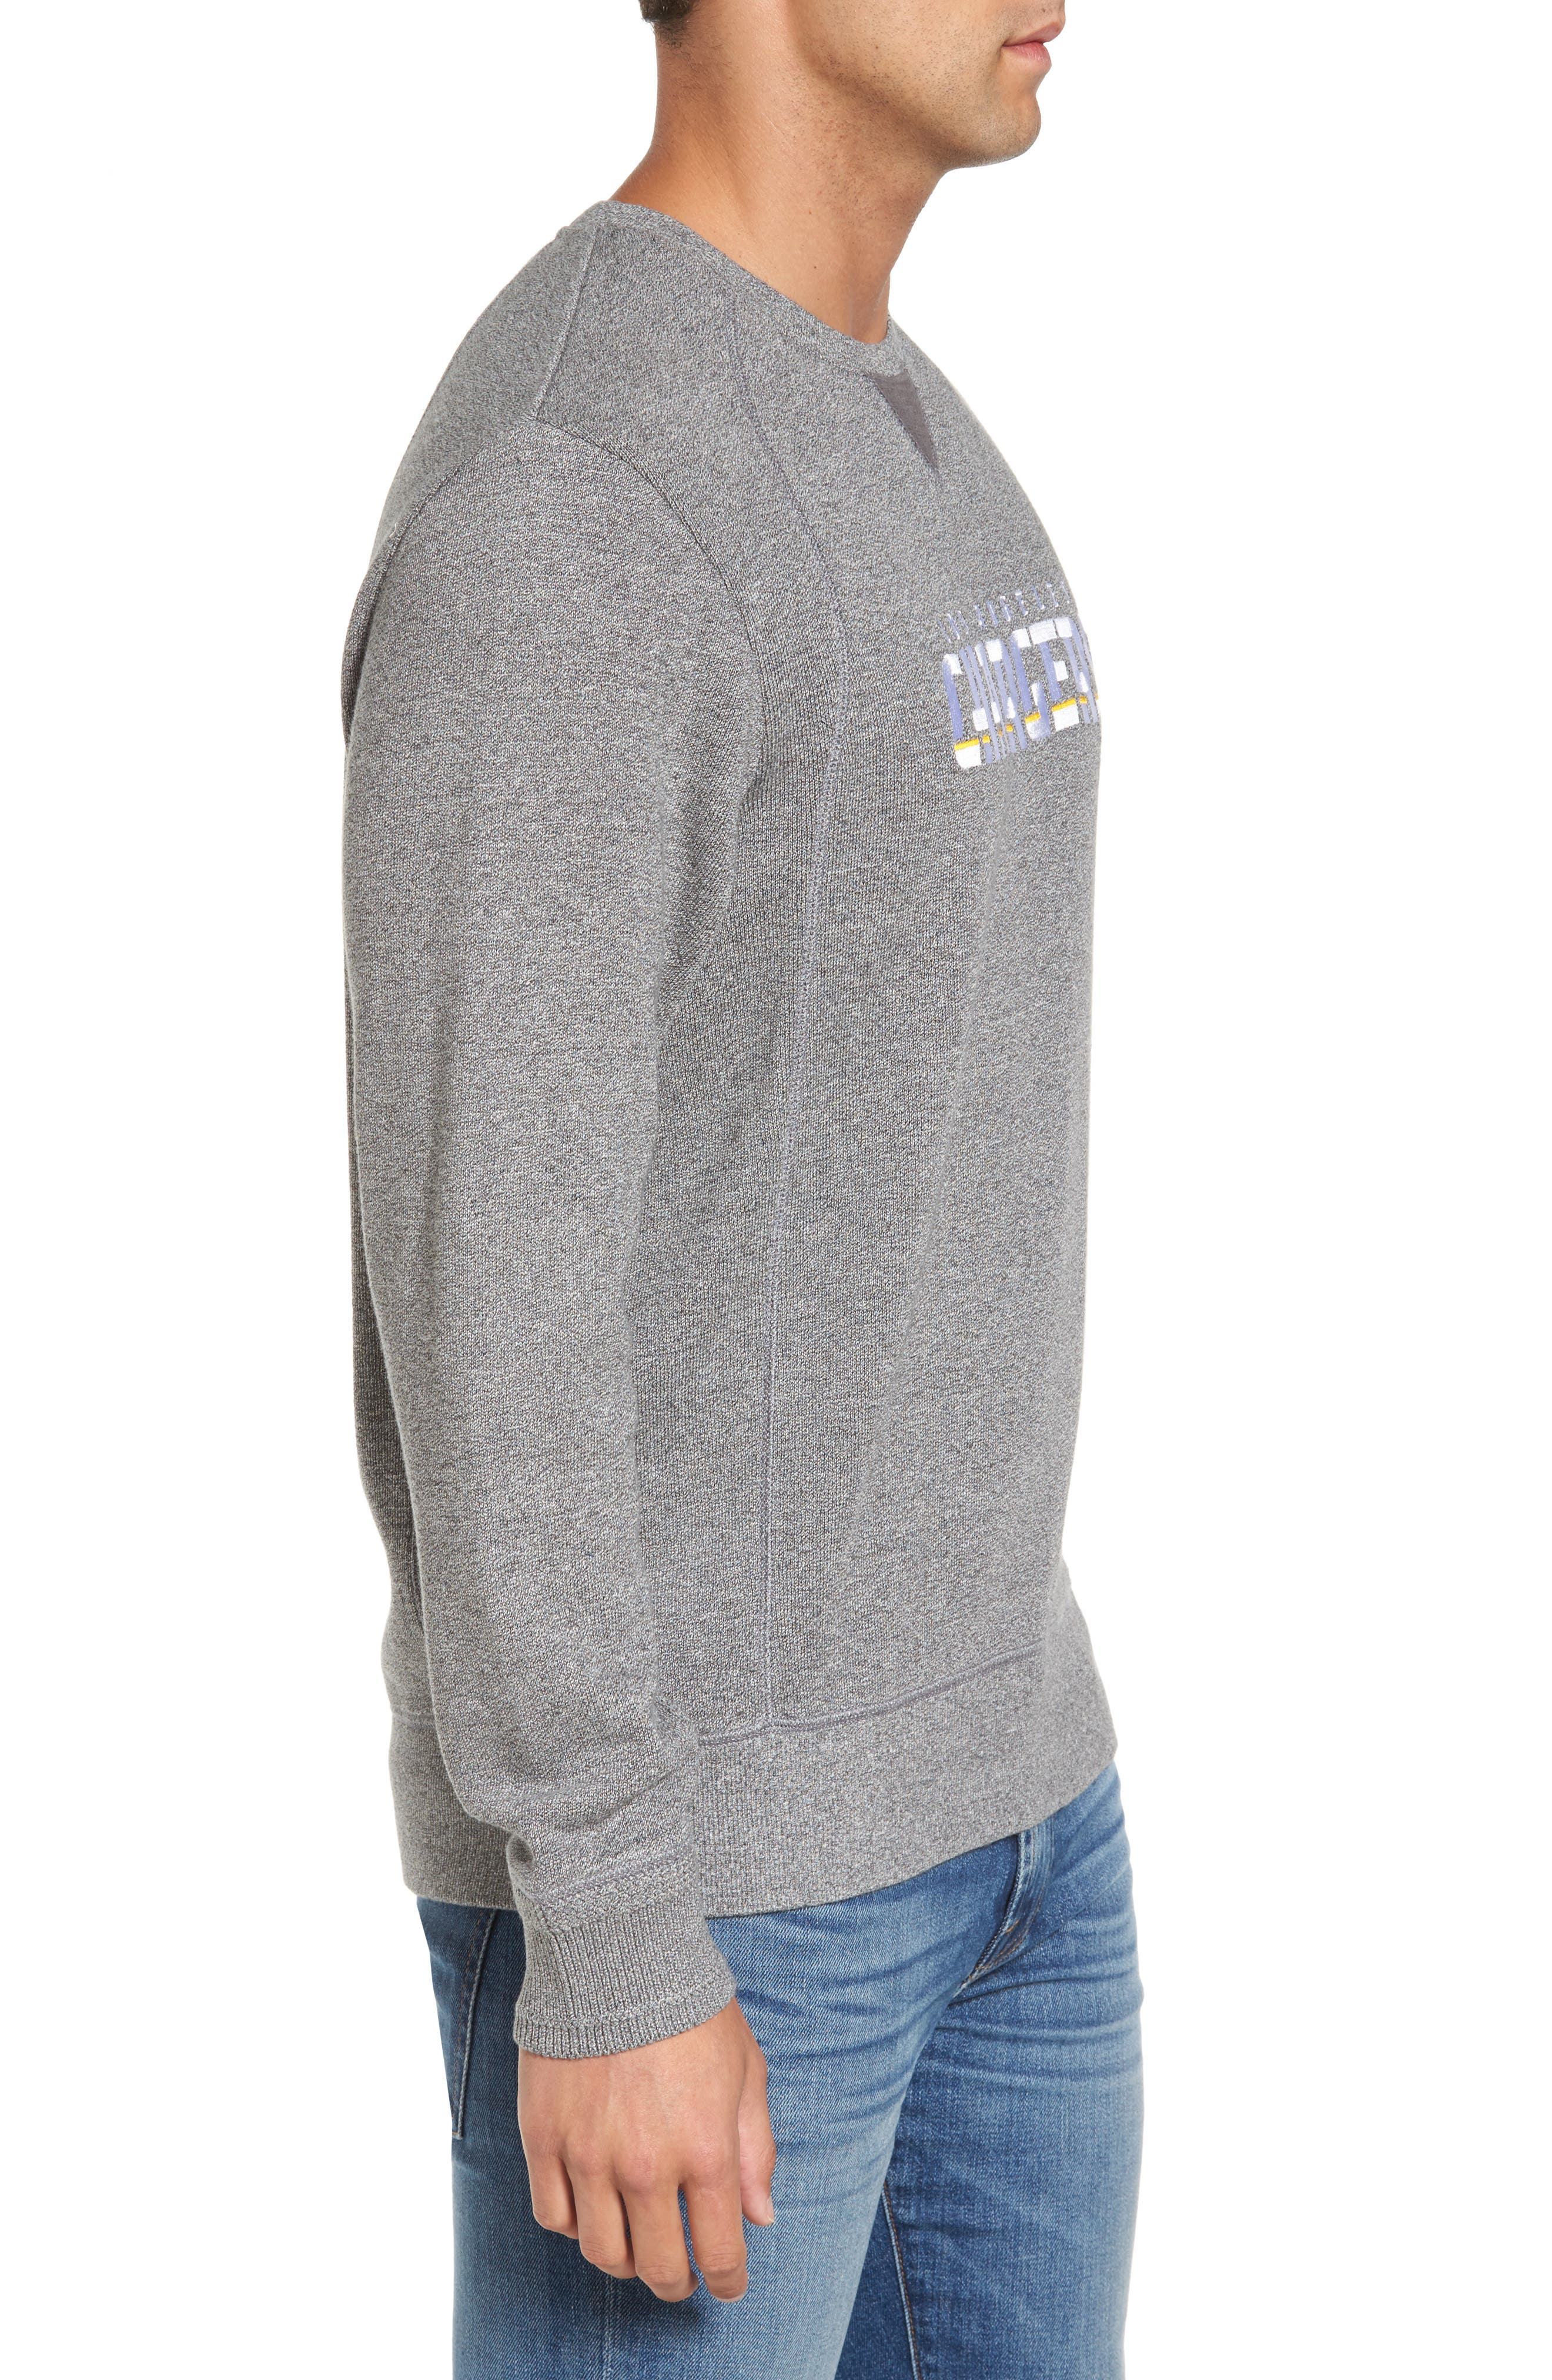 NFL Stitch of Liberty Embroidered Crewneck Sweatshirt,                             Alternate thumbnail 71, color,